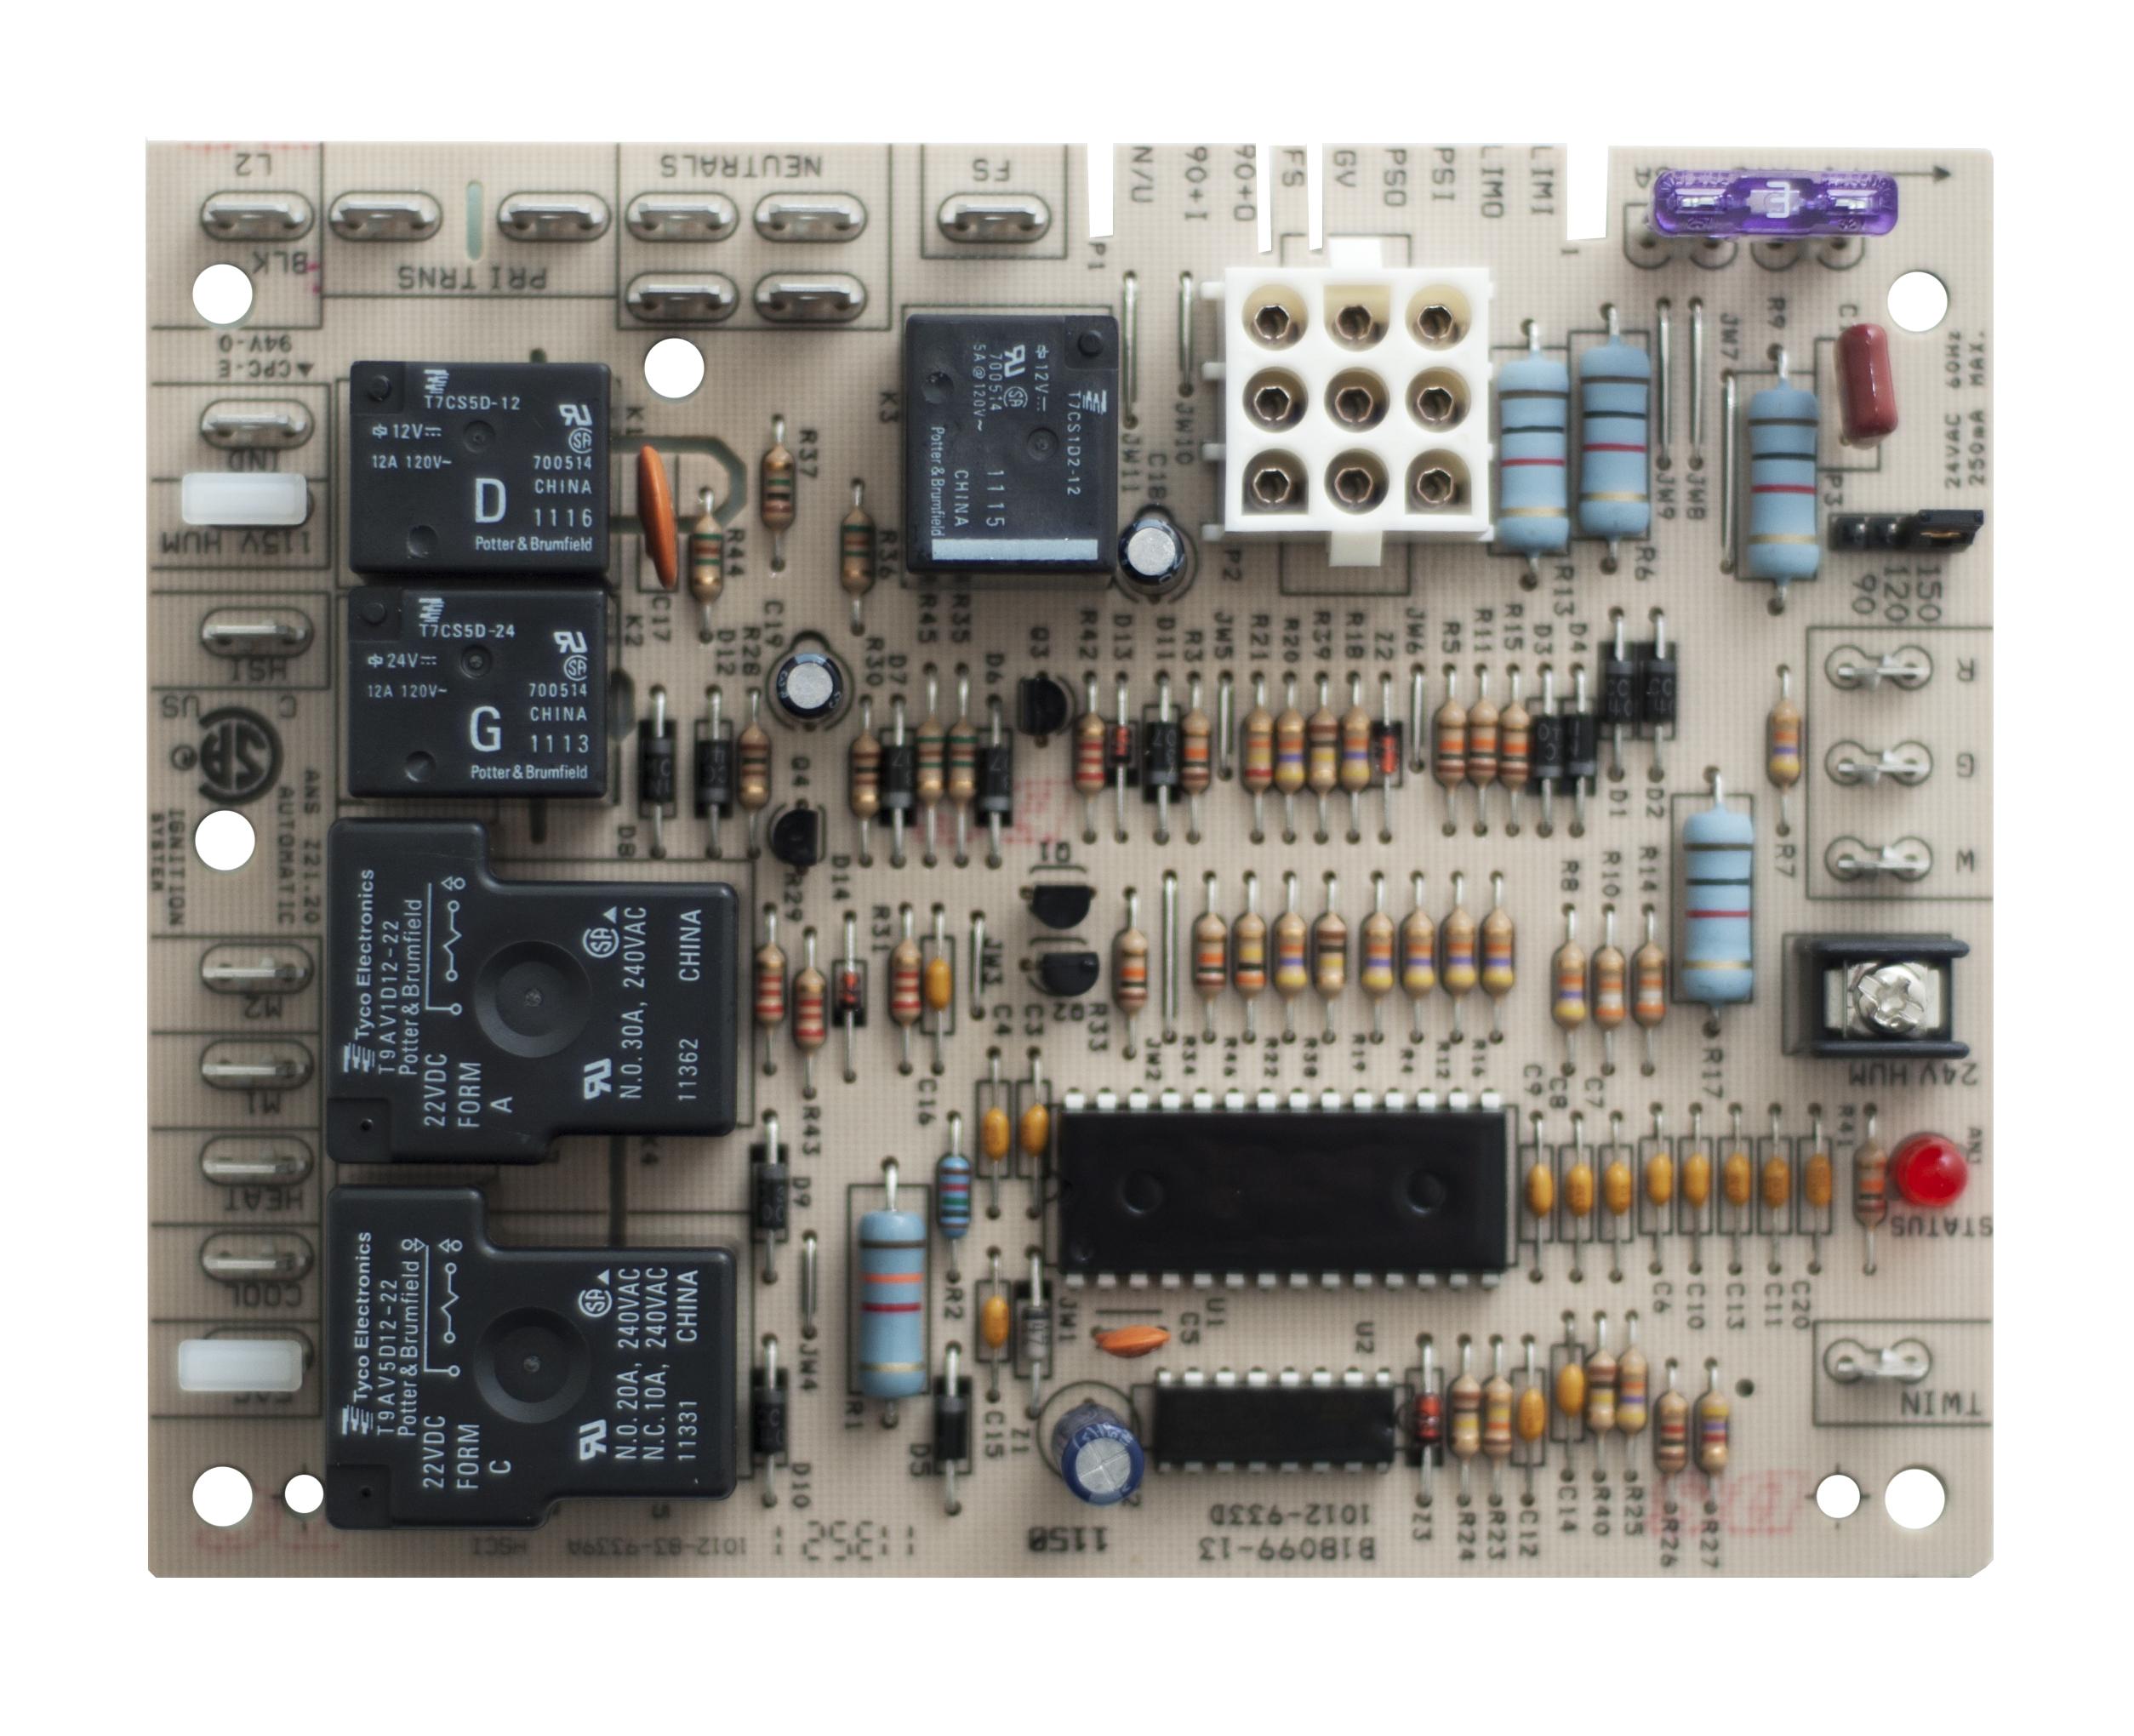 board wiring 3180ub wiring diagram detailed Vaporesso Target Circuit Board Wiring Diagram electronic circuit board sdvr8jat v1 0 schematic diagram circuit board wiring 3180ub